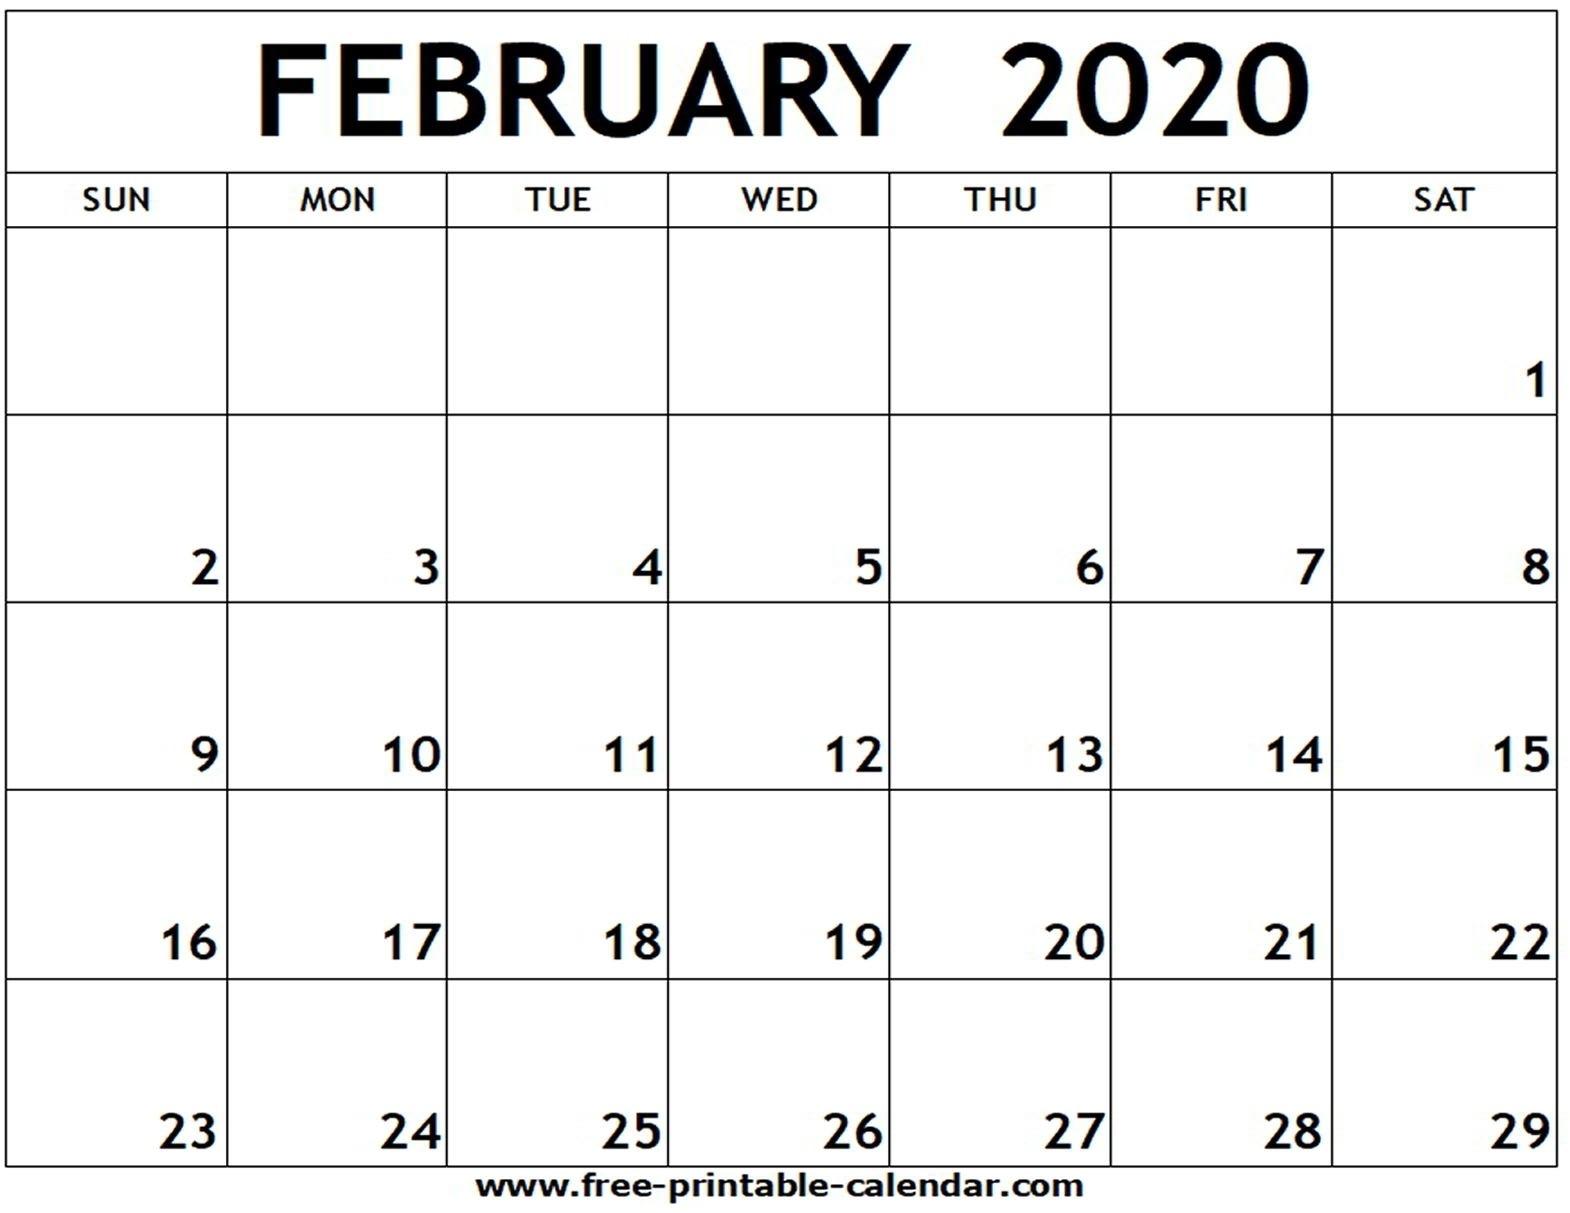 February 2020 Printable Calendar – Free-Printable-Calendar  Blank Calendar 2020